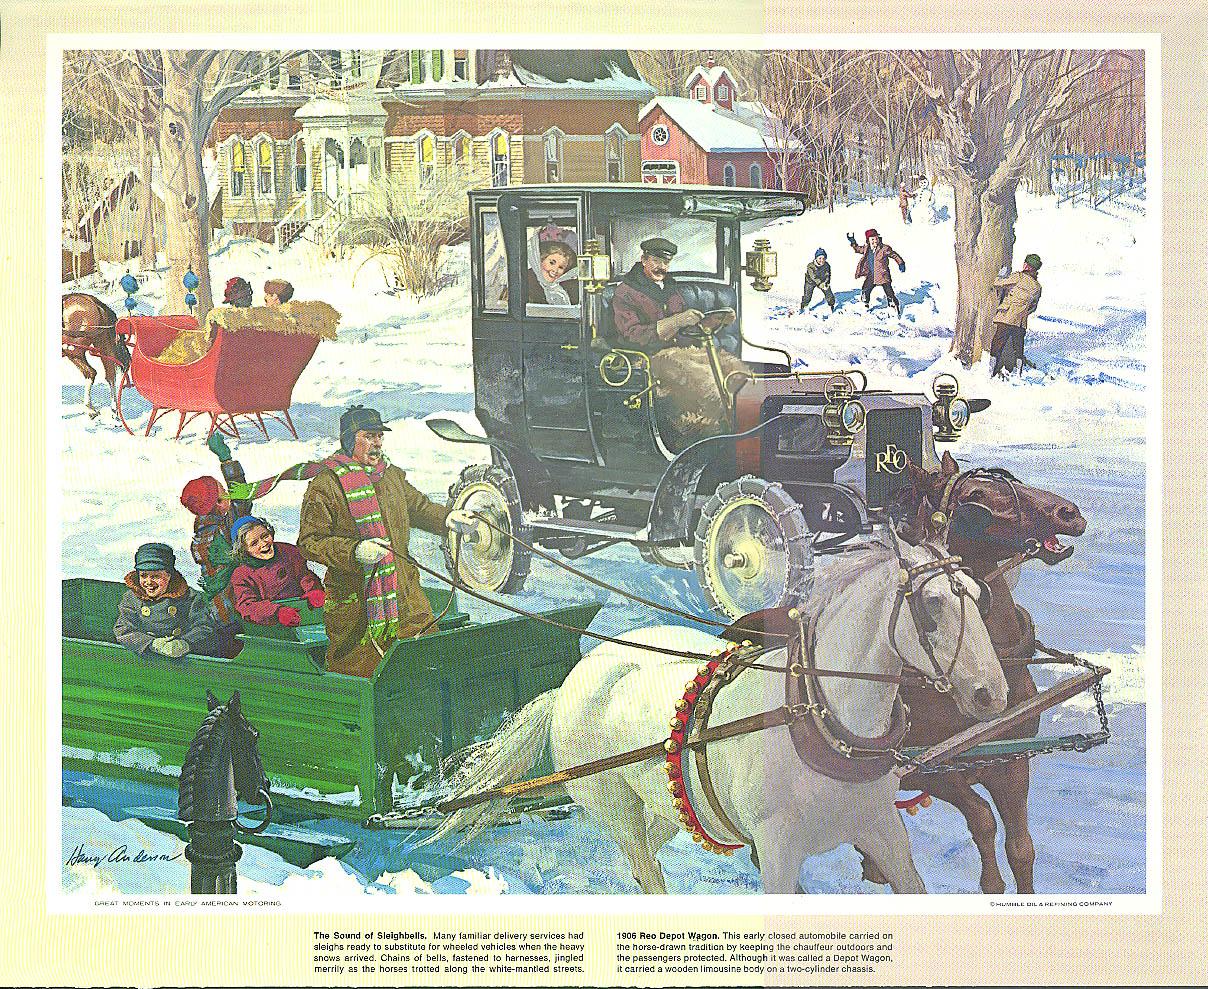 1906 Reo Depot Wagon & horse-drawn sleighs Humble Oil calendar print 1960s